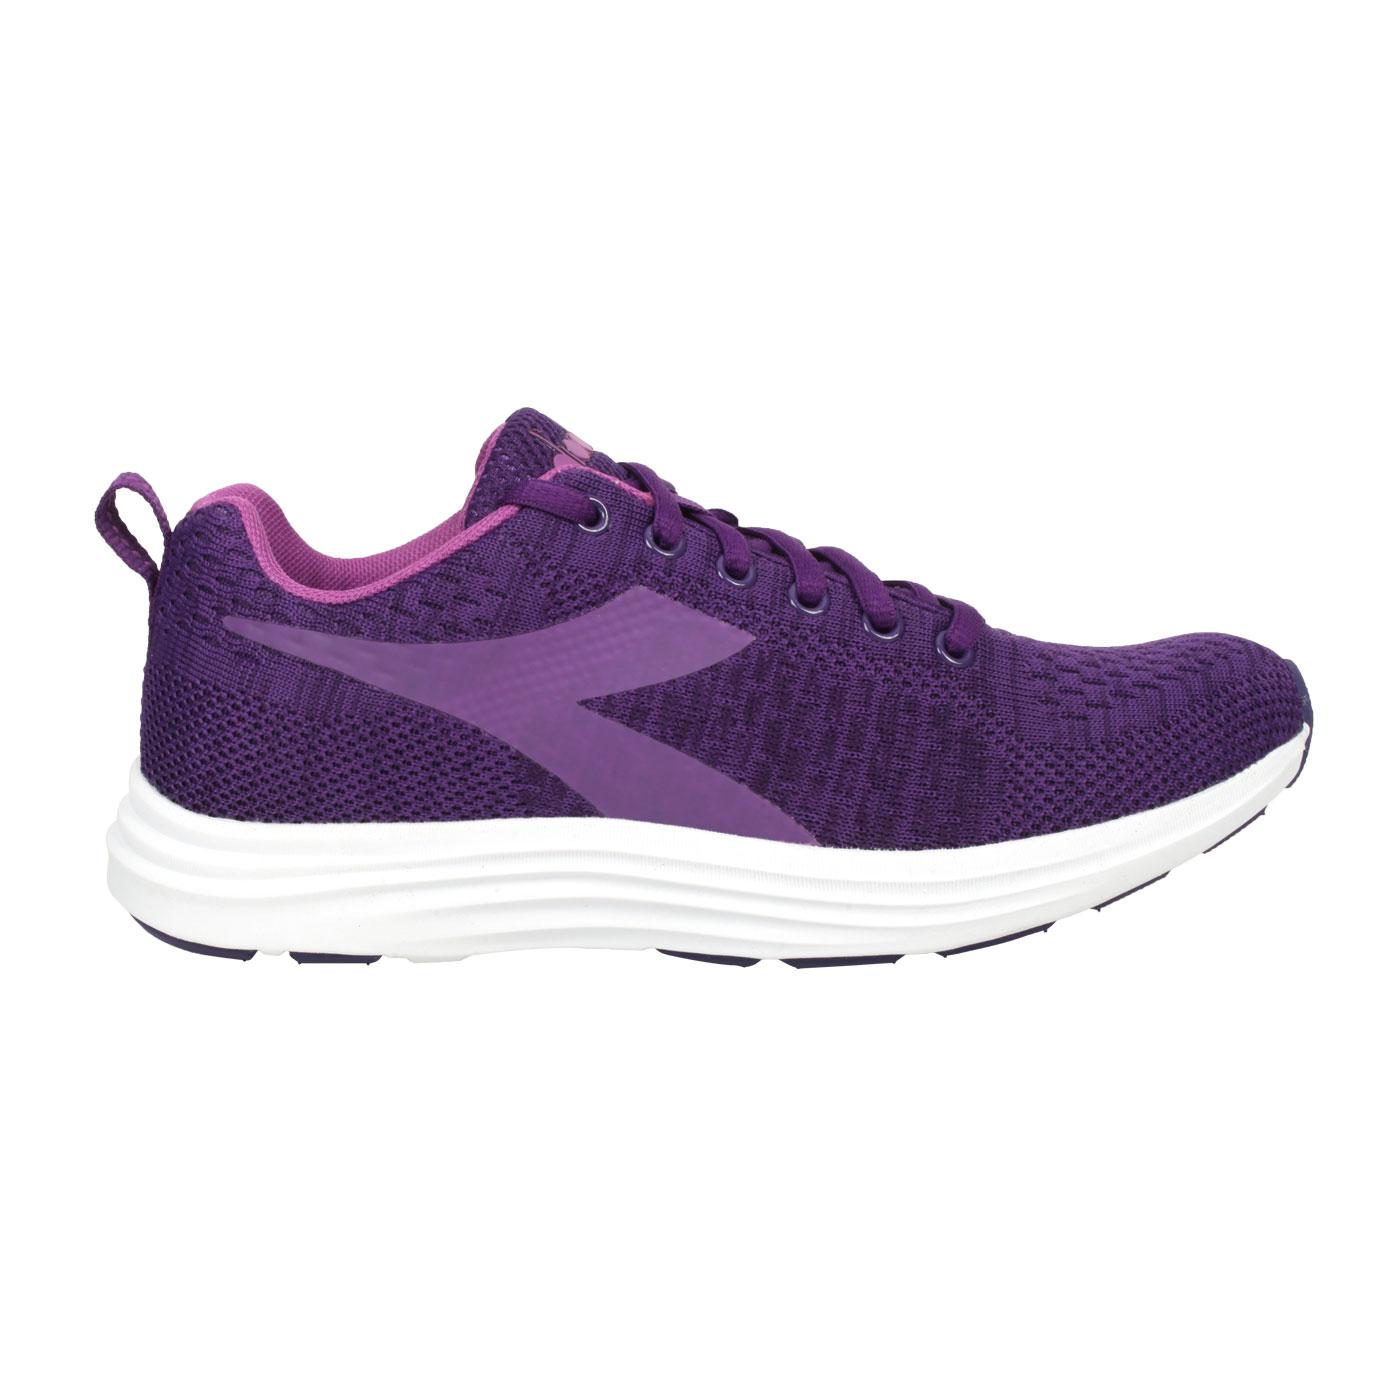 DIADORA 女款進口慢跑鞋 DA175597-C8909 - 深紫